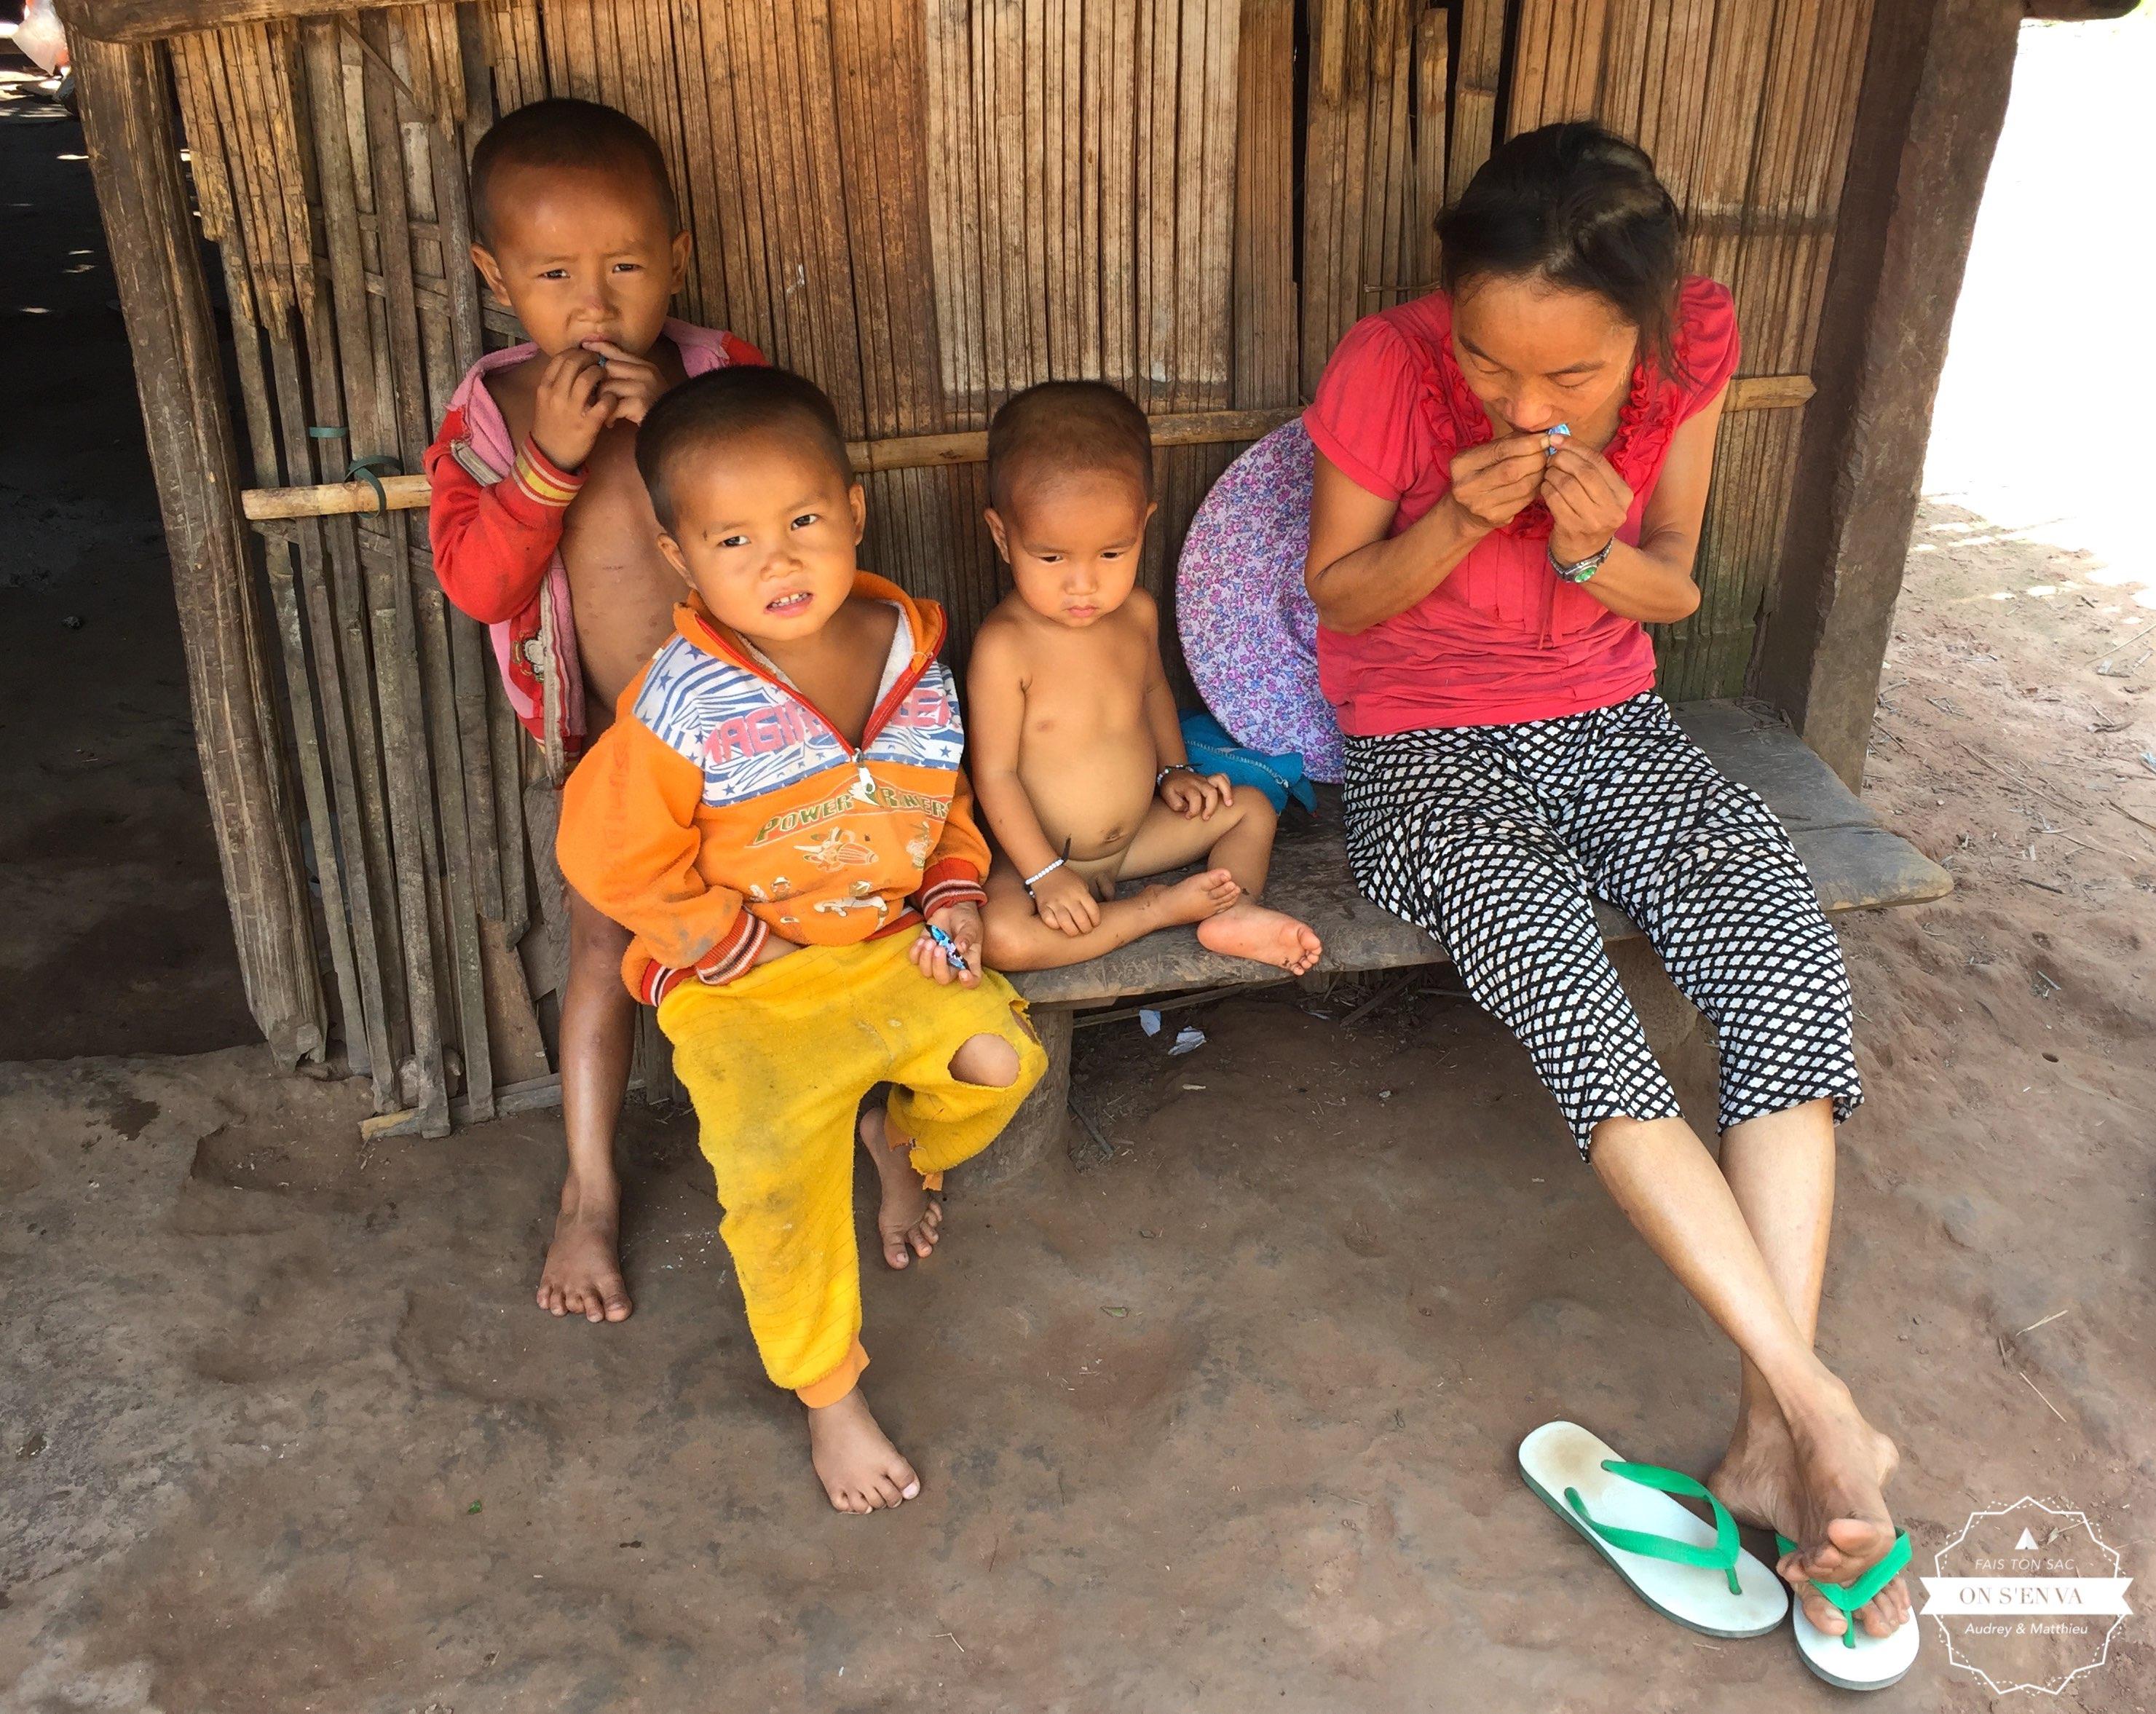 Une famille Hmong